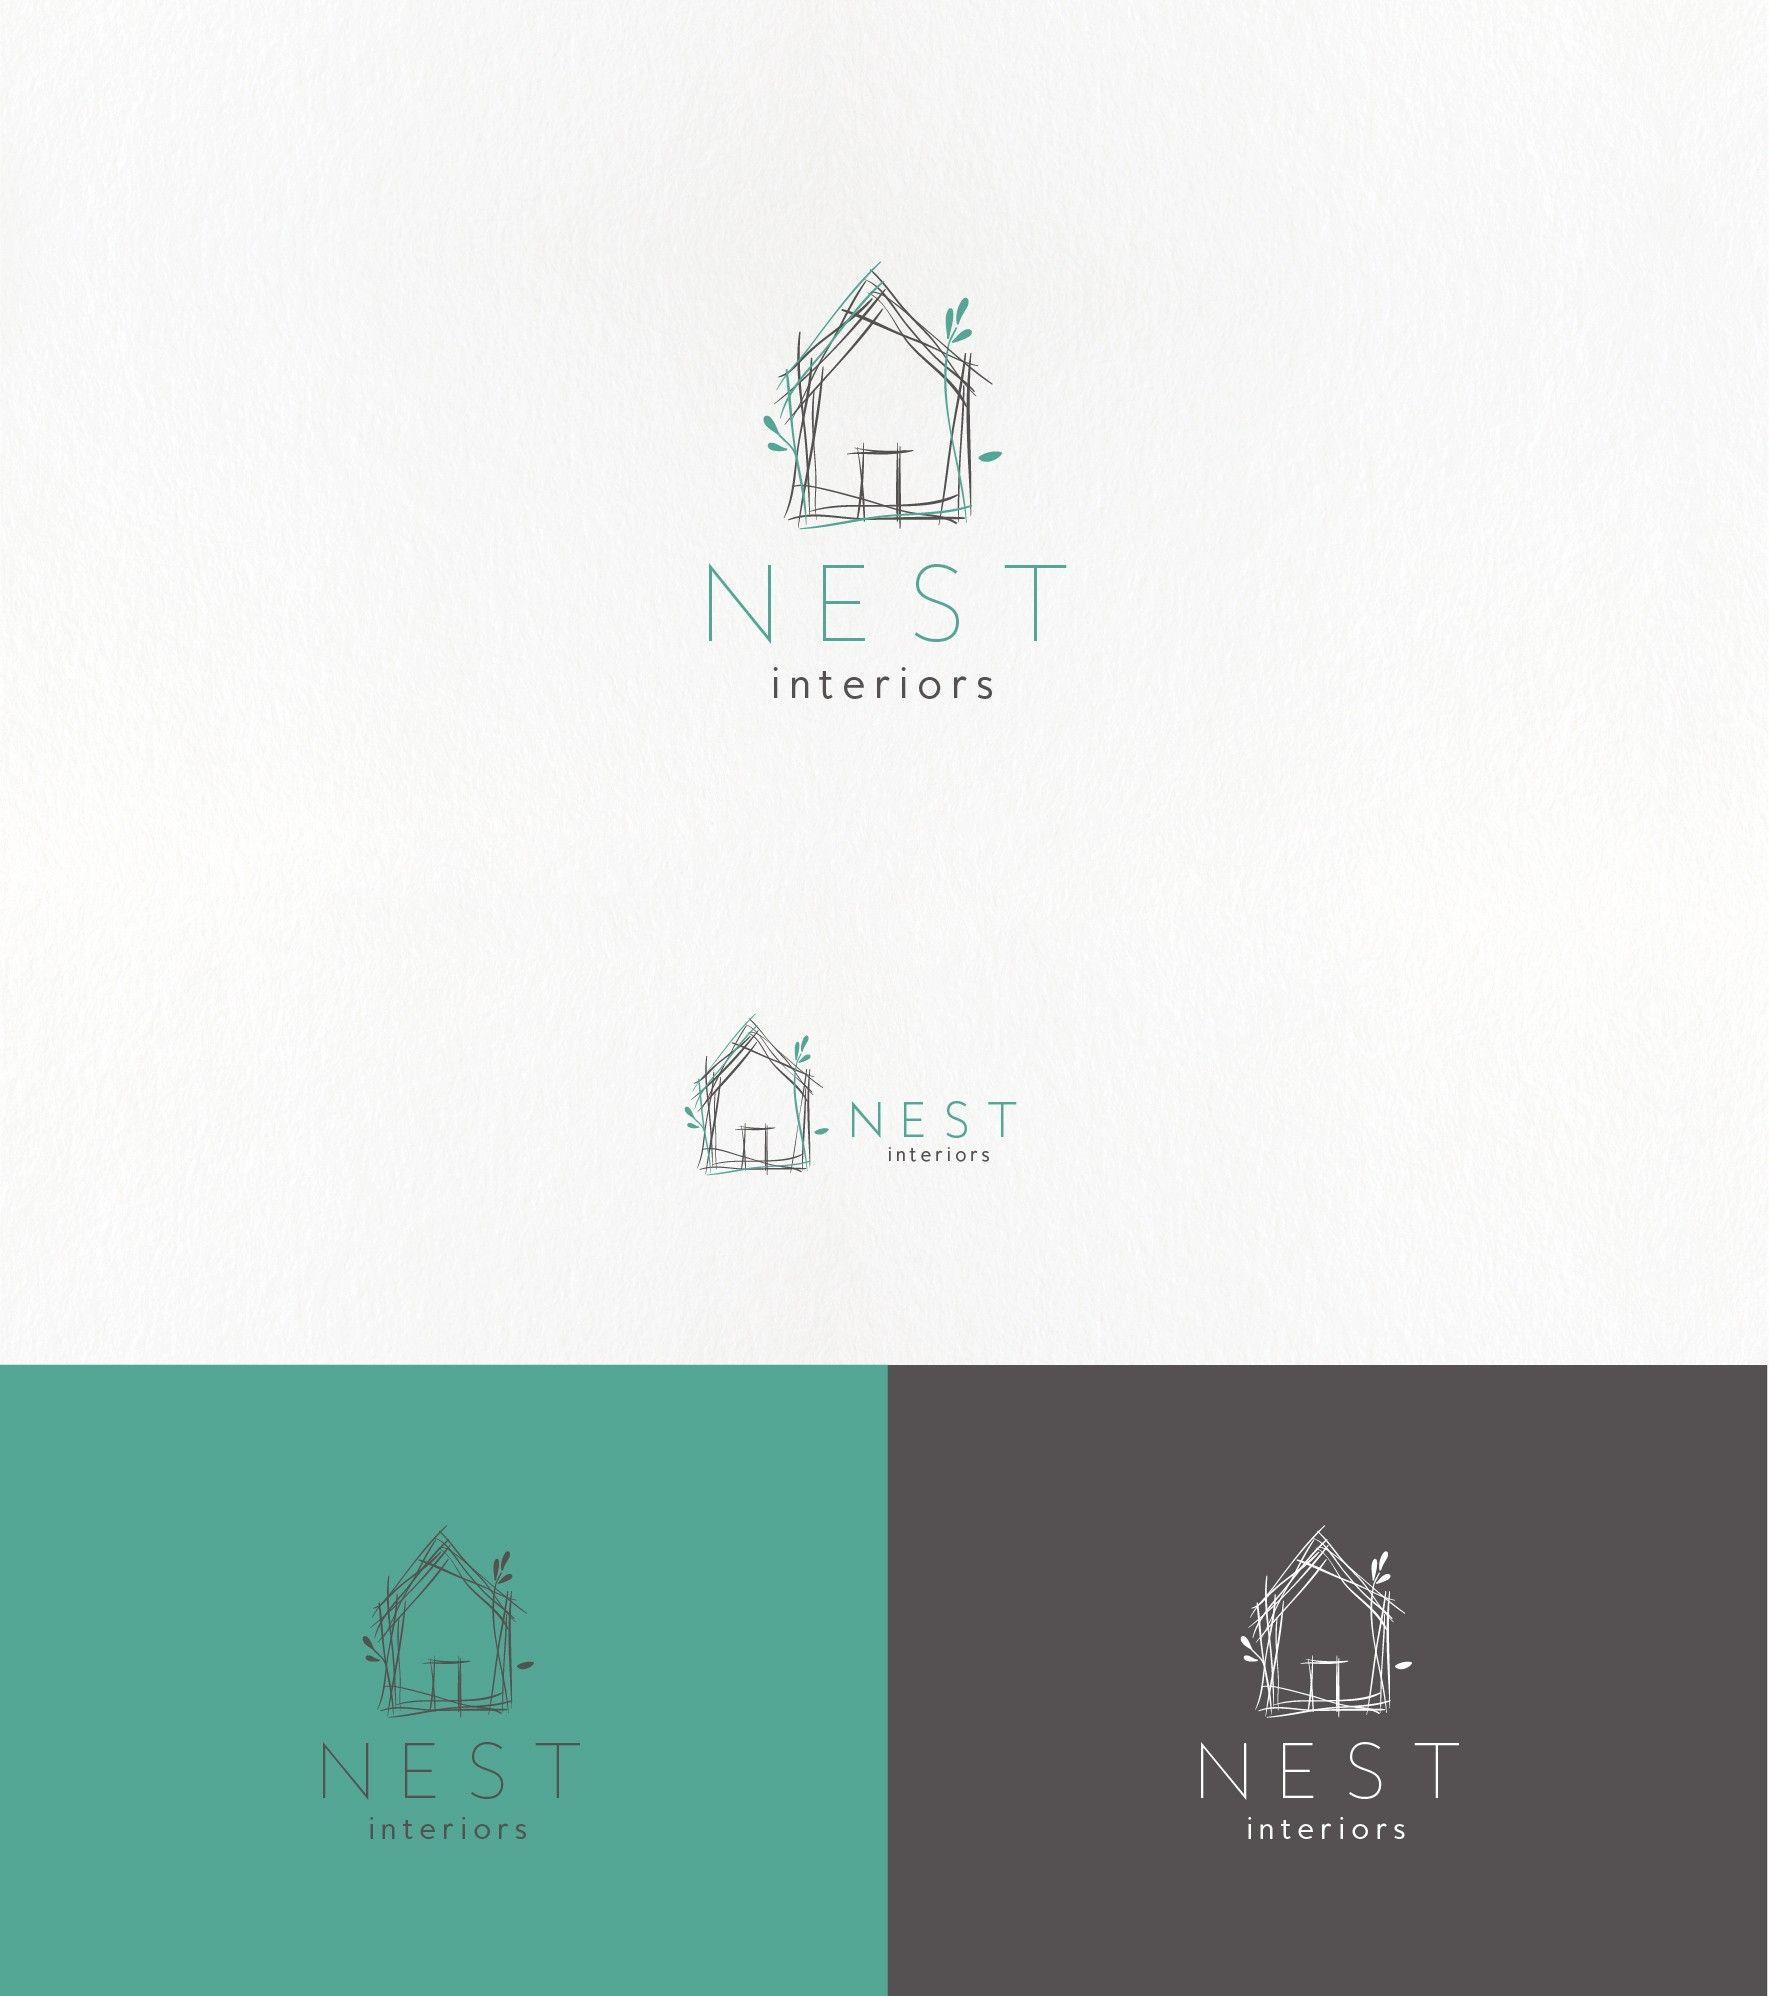 Handdrawn minimal logo for an interior design company